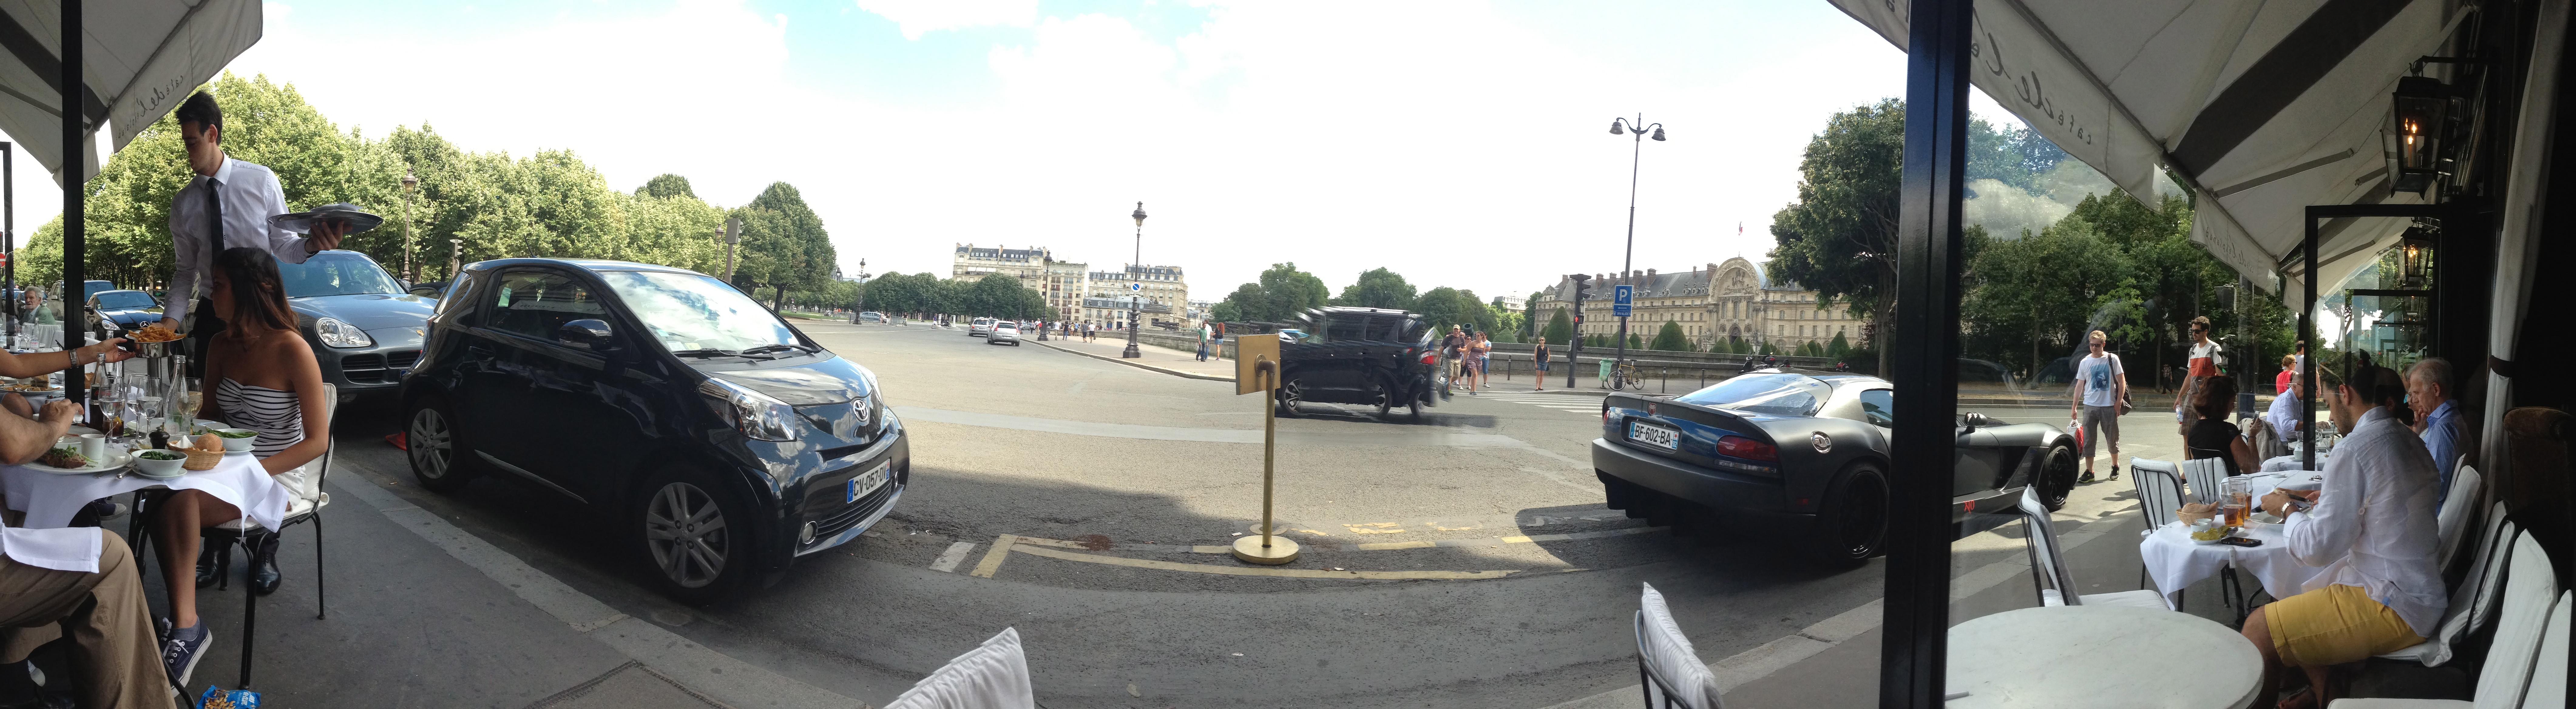 Café de l´esplanade, Paris